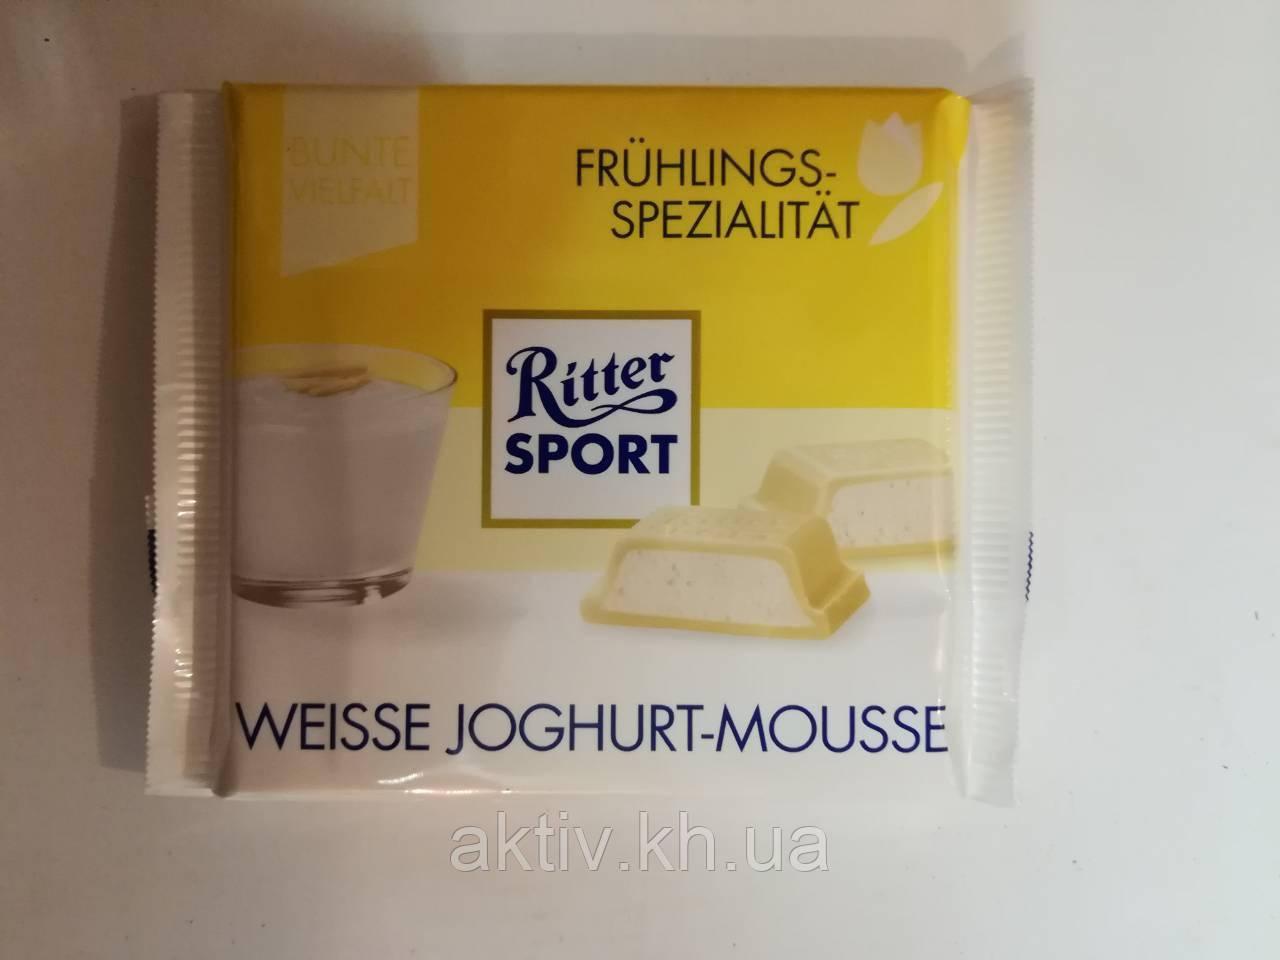 Ritter Sport wеisse joghurt mousse 100гр